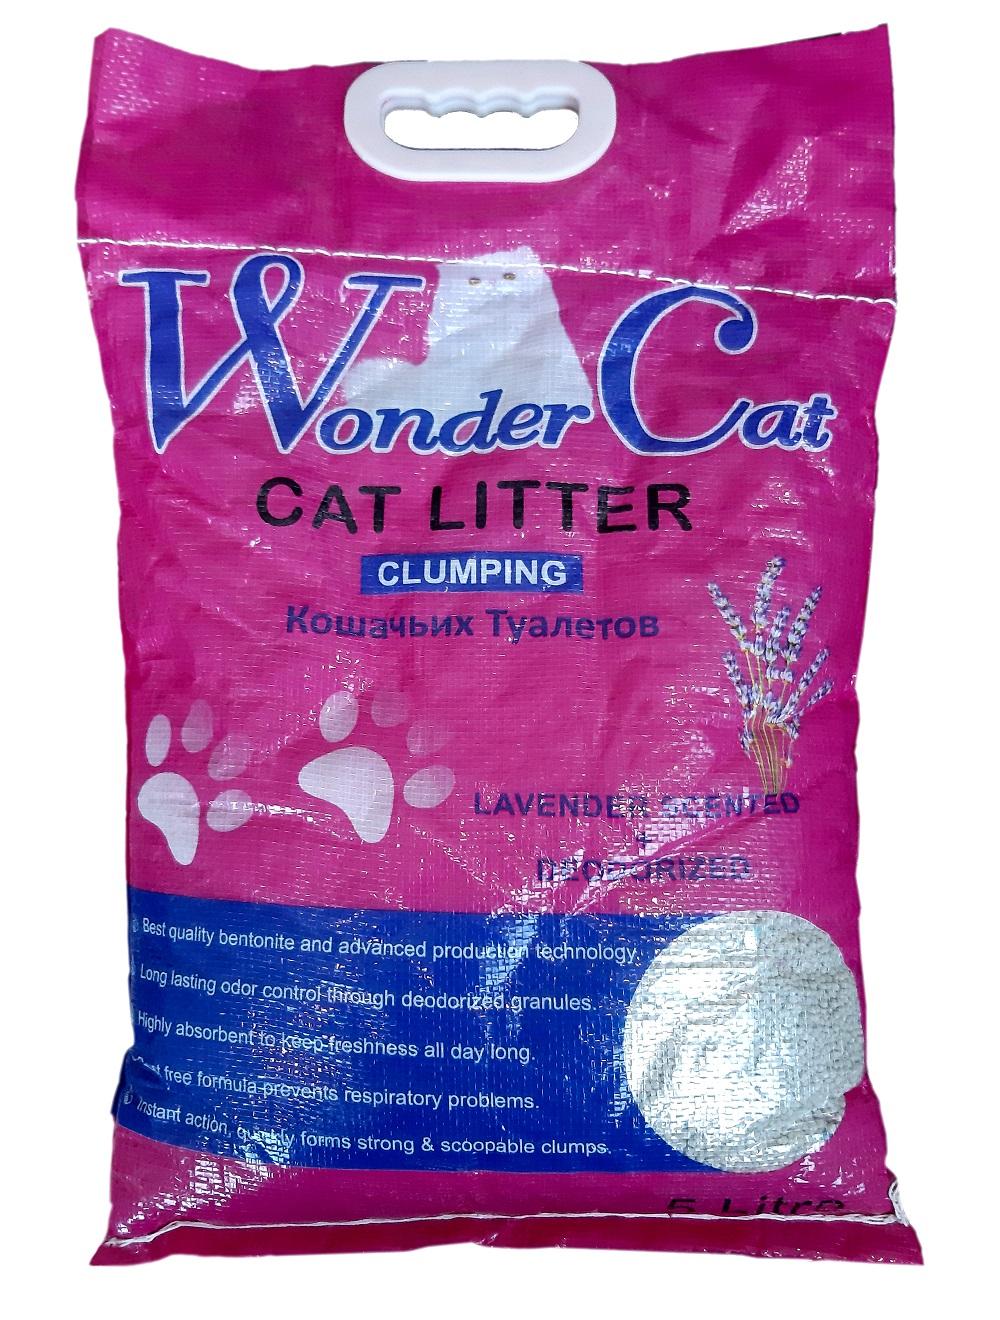 Wonder Cat Litter Lavender Perfume - Pet Accessories - Pet Store - Pet supplies